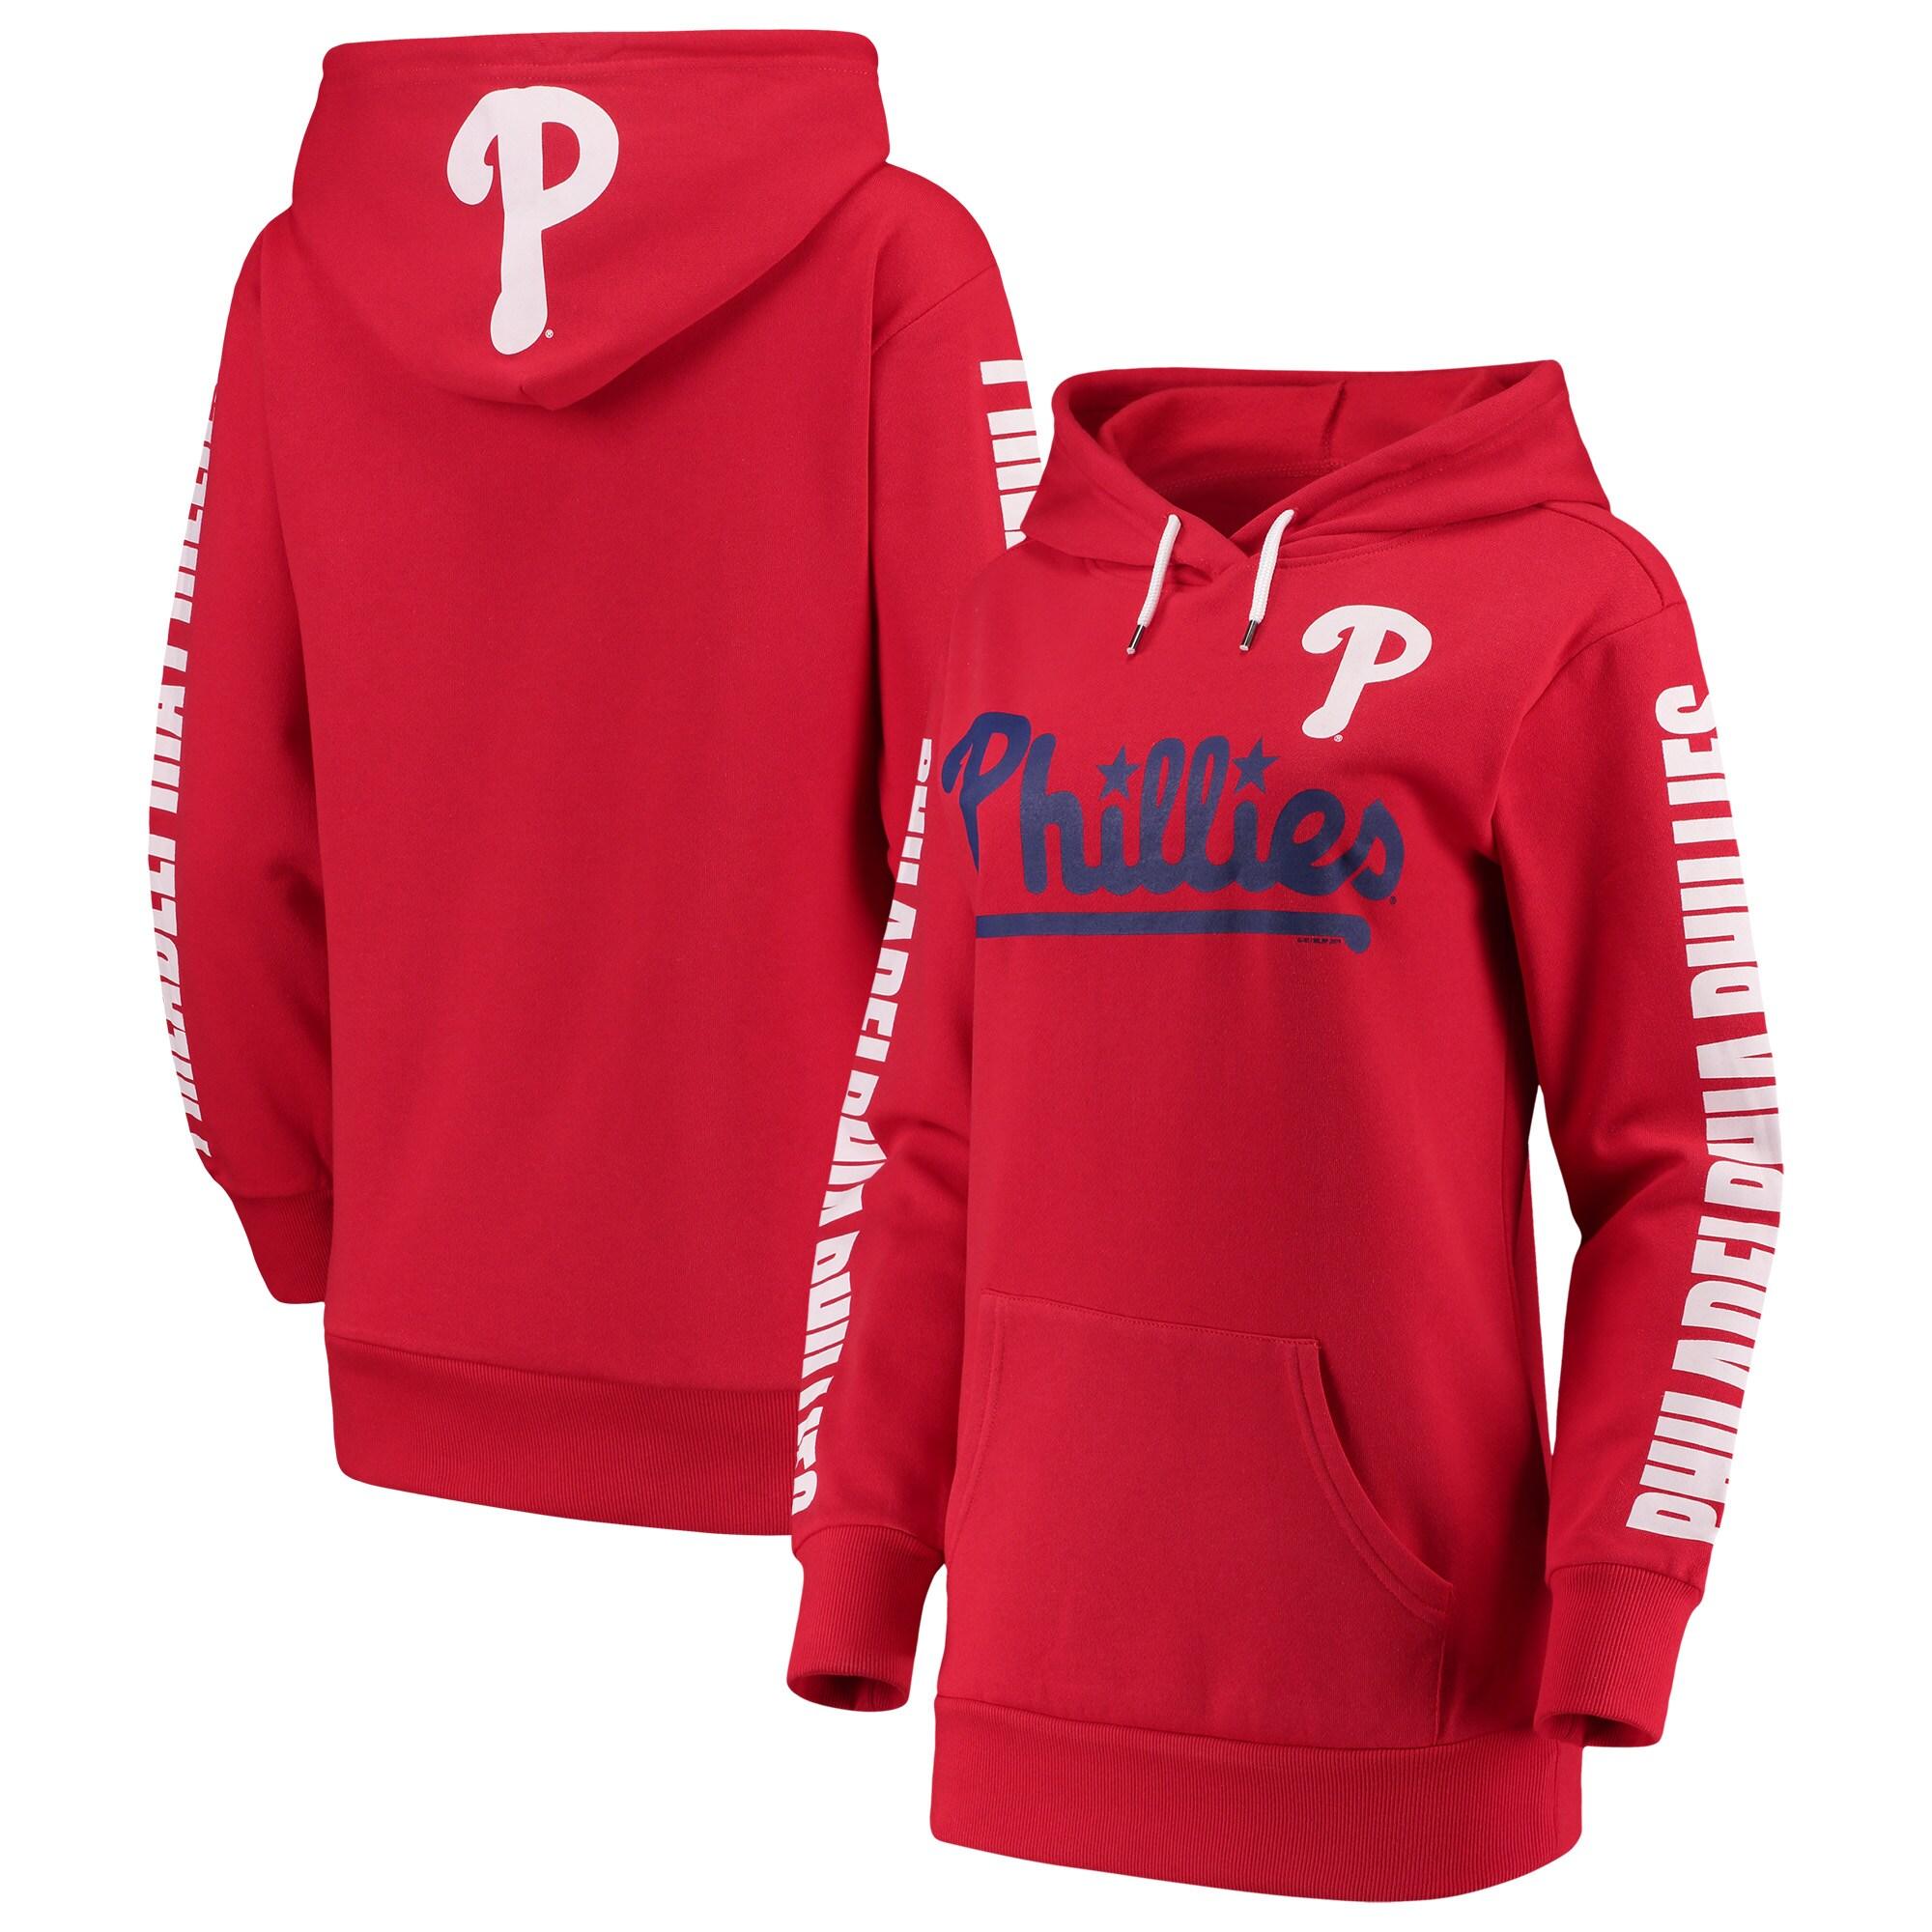 Philadelphia Phillies G-III 4Her by Carl Banks Women's Extra Innings Pullover Hoodie - Red